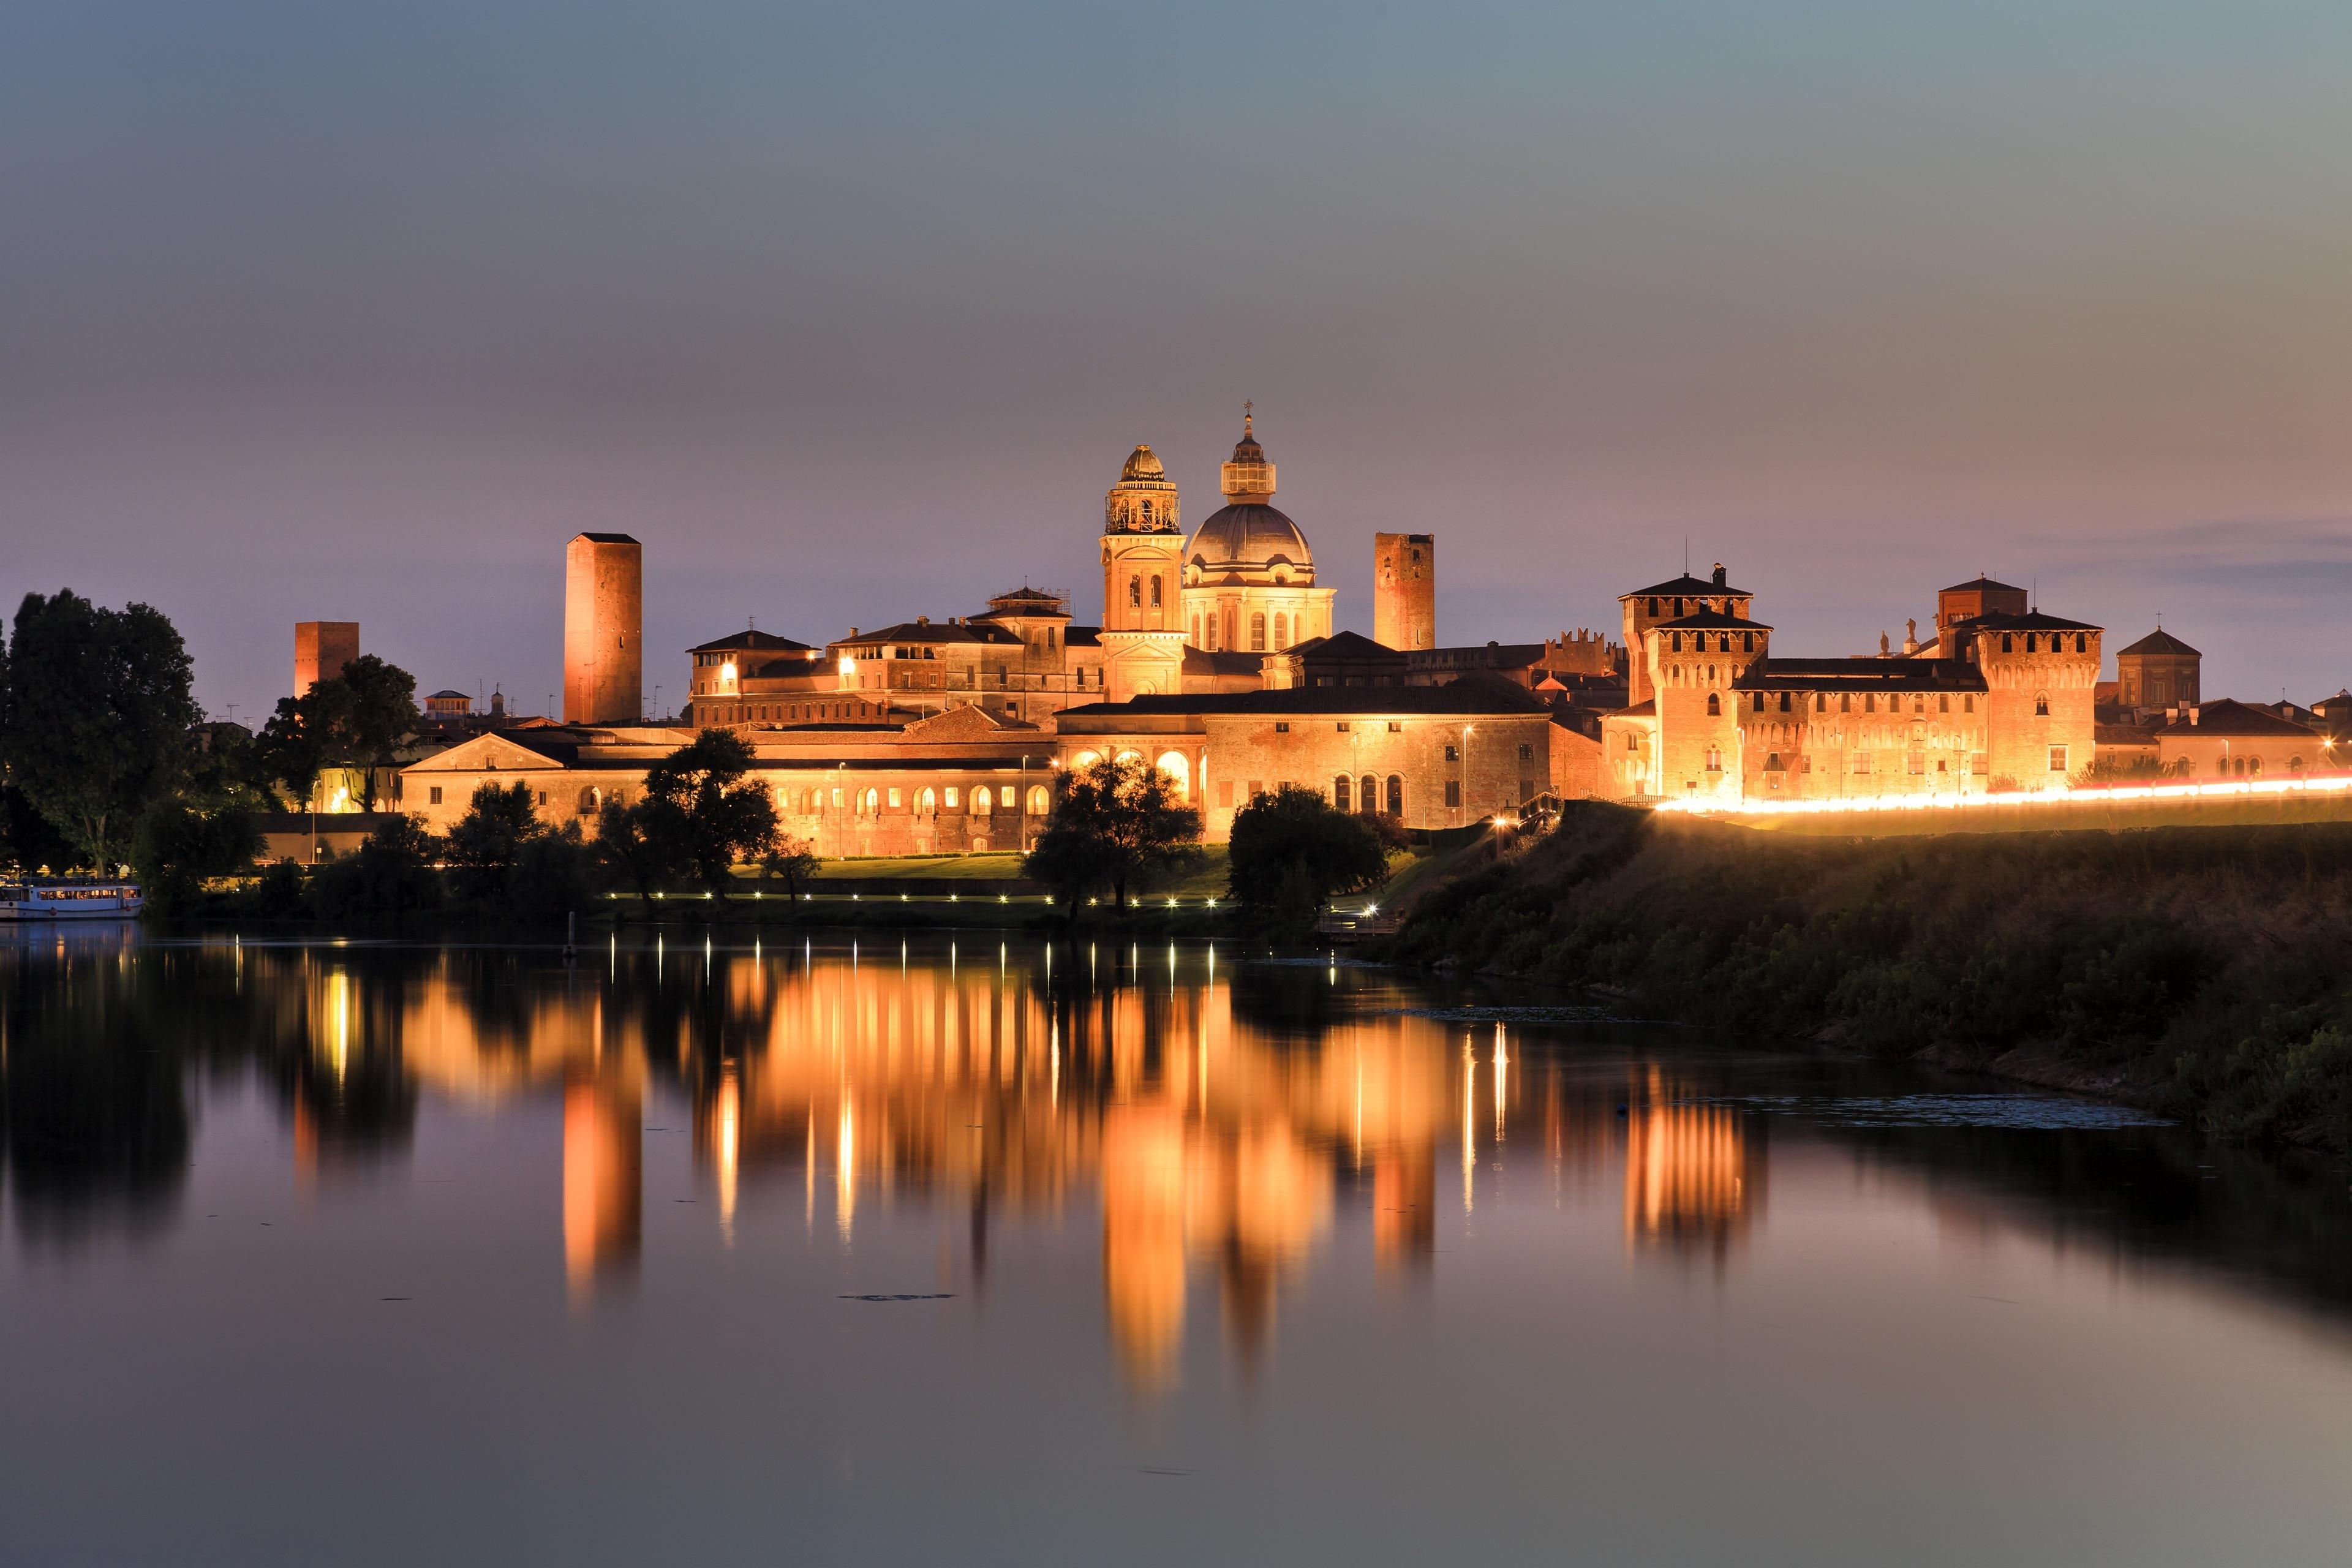 Hertogelijk Paleis van Mantova, Mantua, Lombardije, Italië